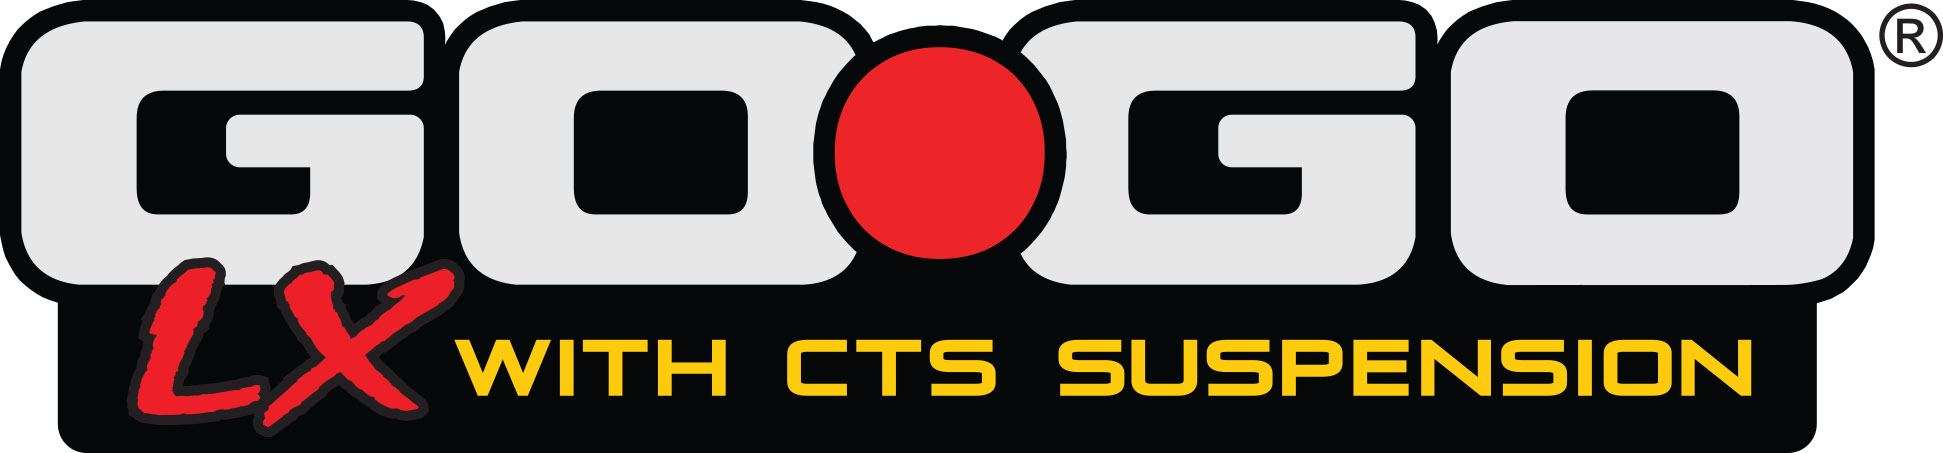 victory-9-logo.jpg